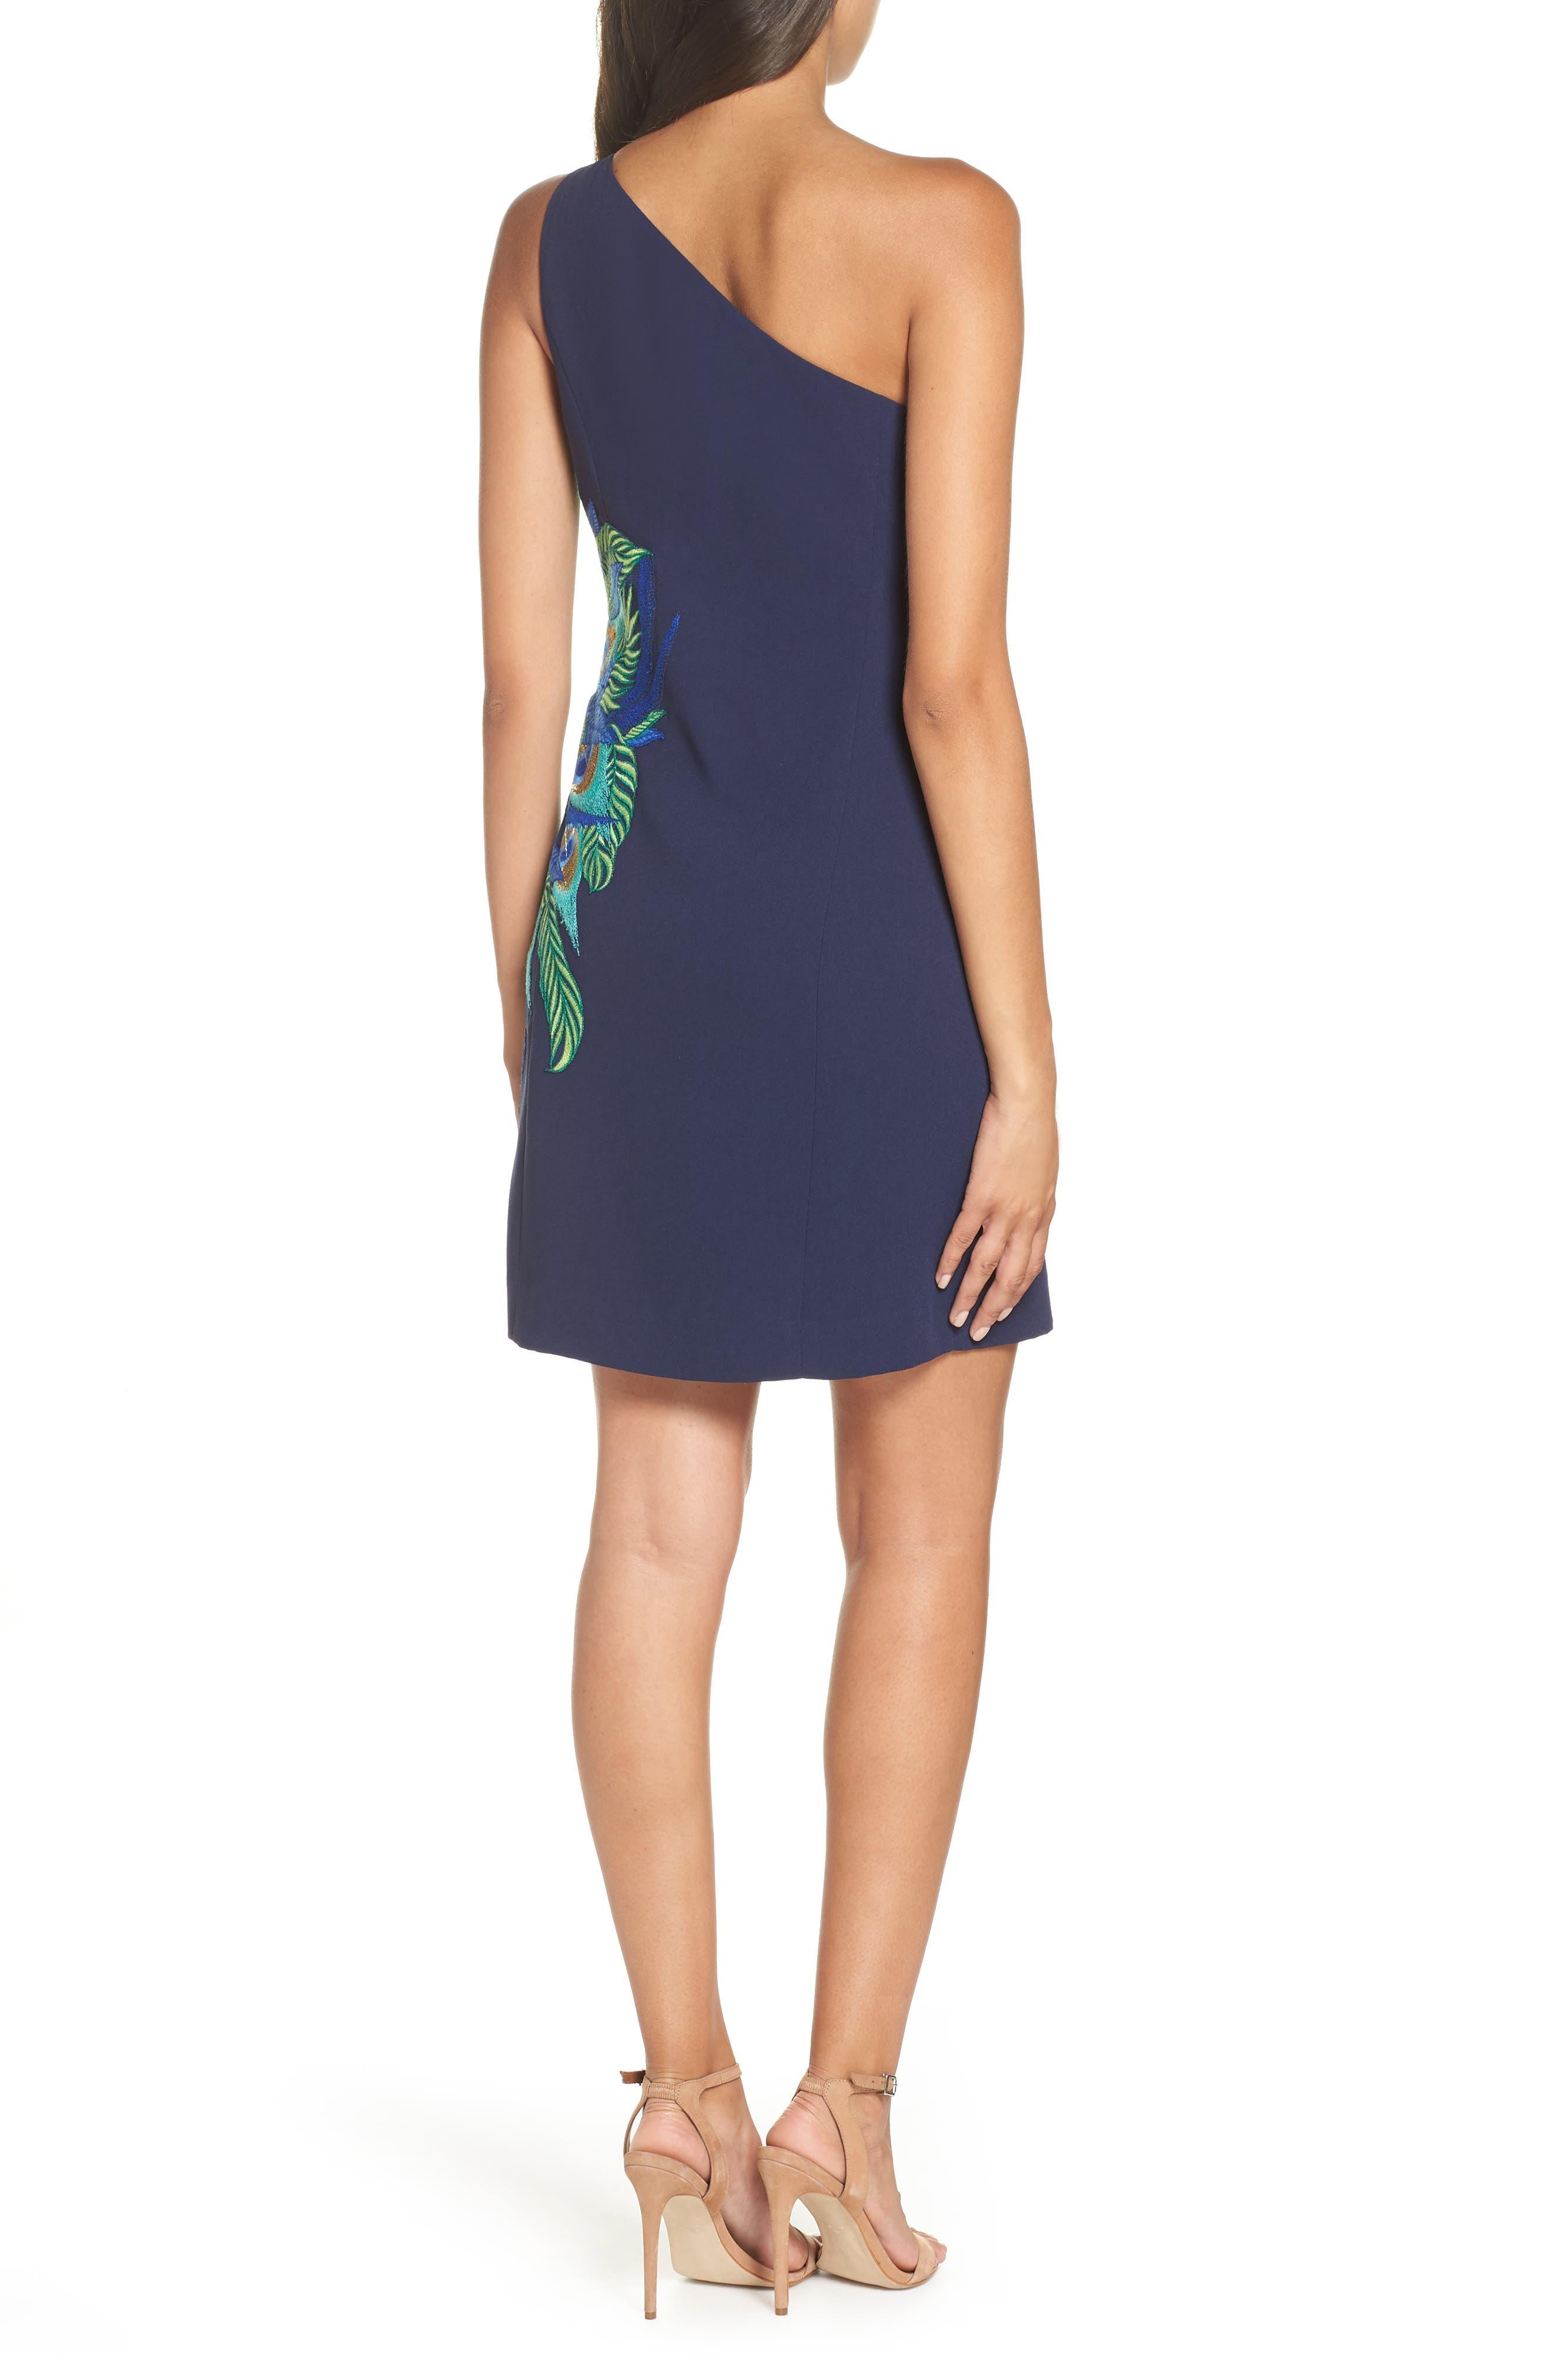 Lily Pulitzer<sup>®</sup> Jamie One-Shoulder Dress,                             Alternate thumbnail 2, color,                             TRUE NAVY